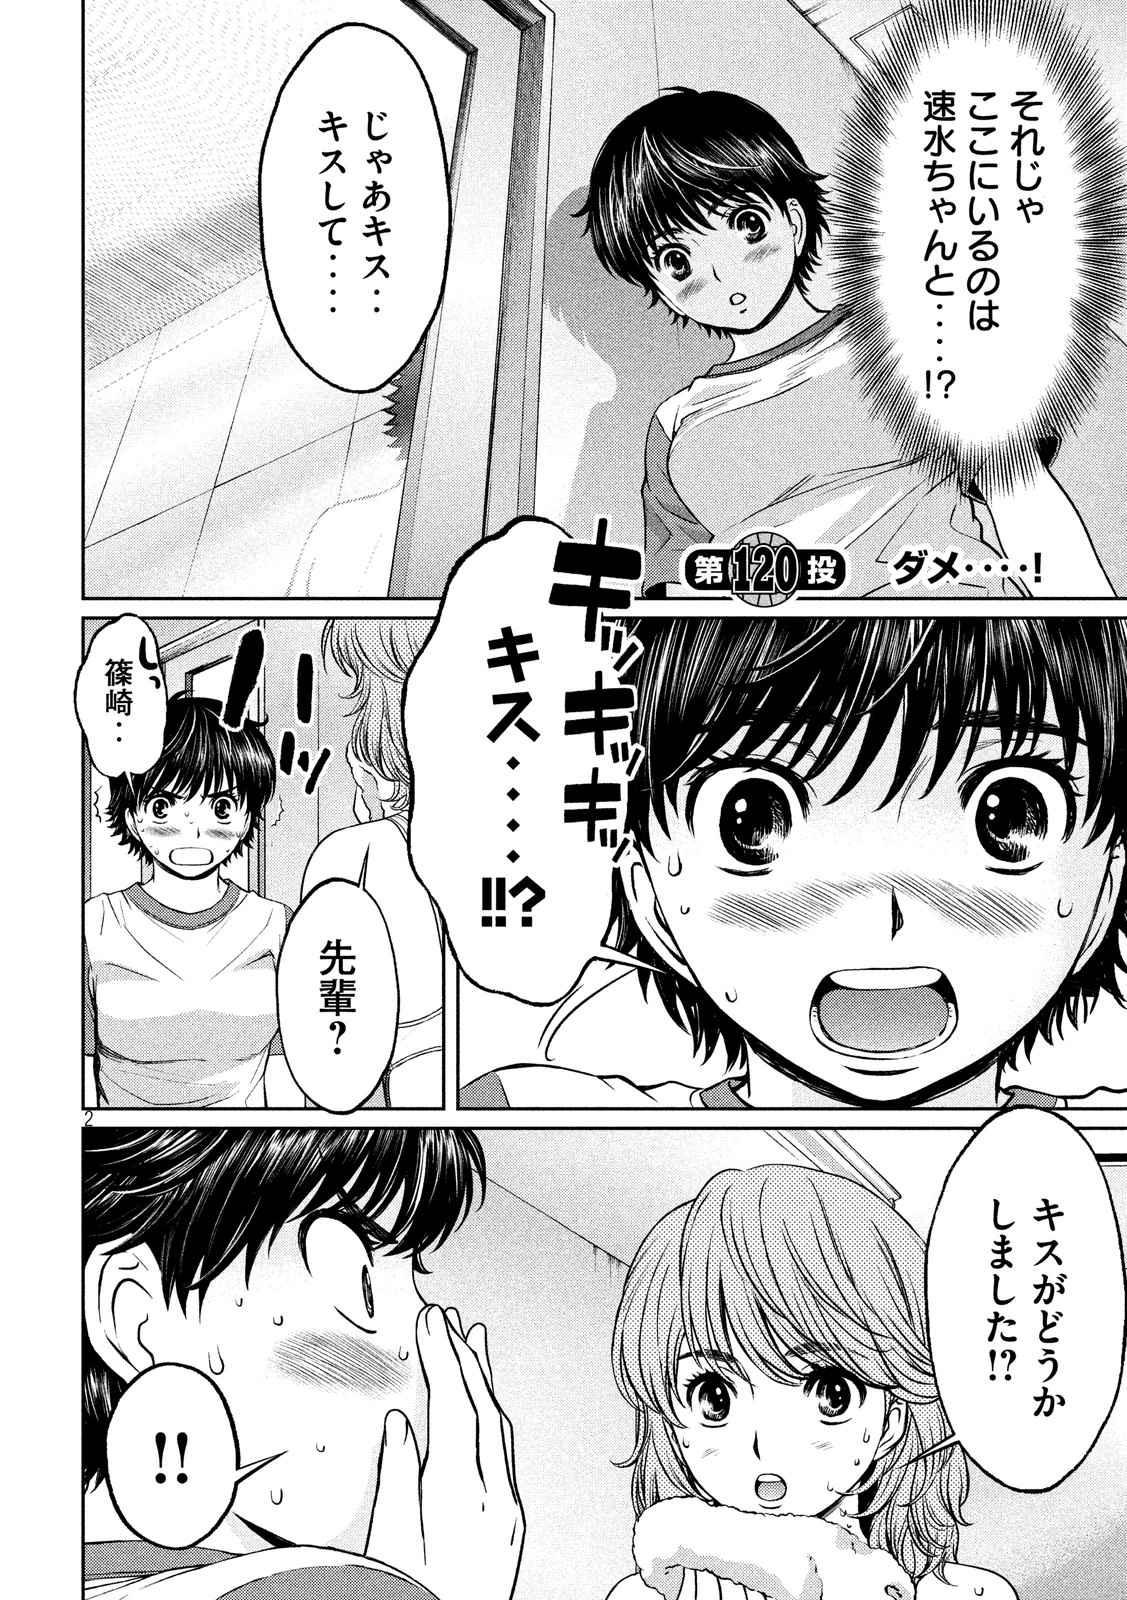 Hantsu x Trash - Chapter 120 - Page 2